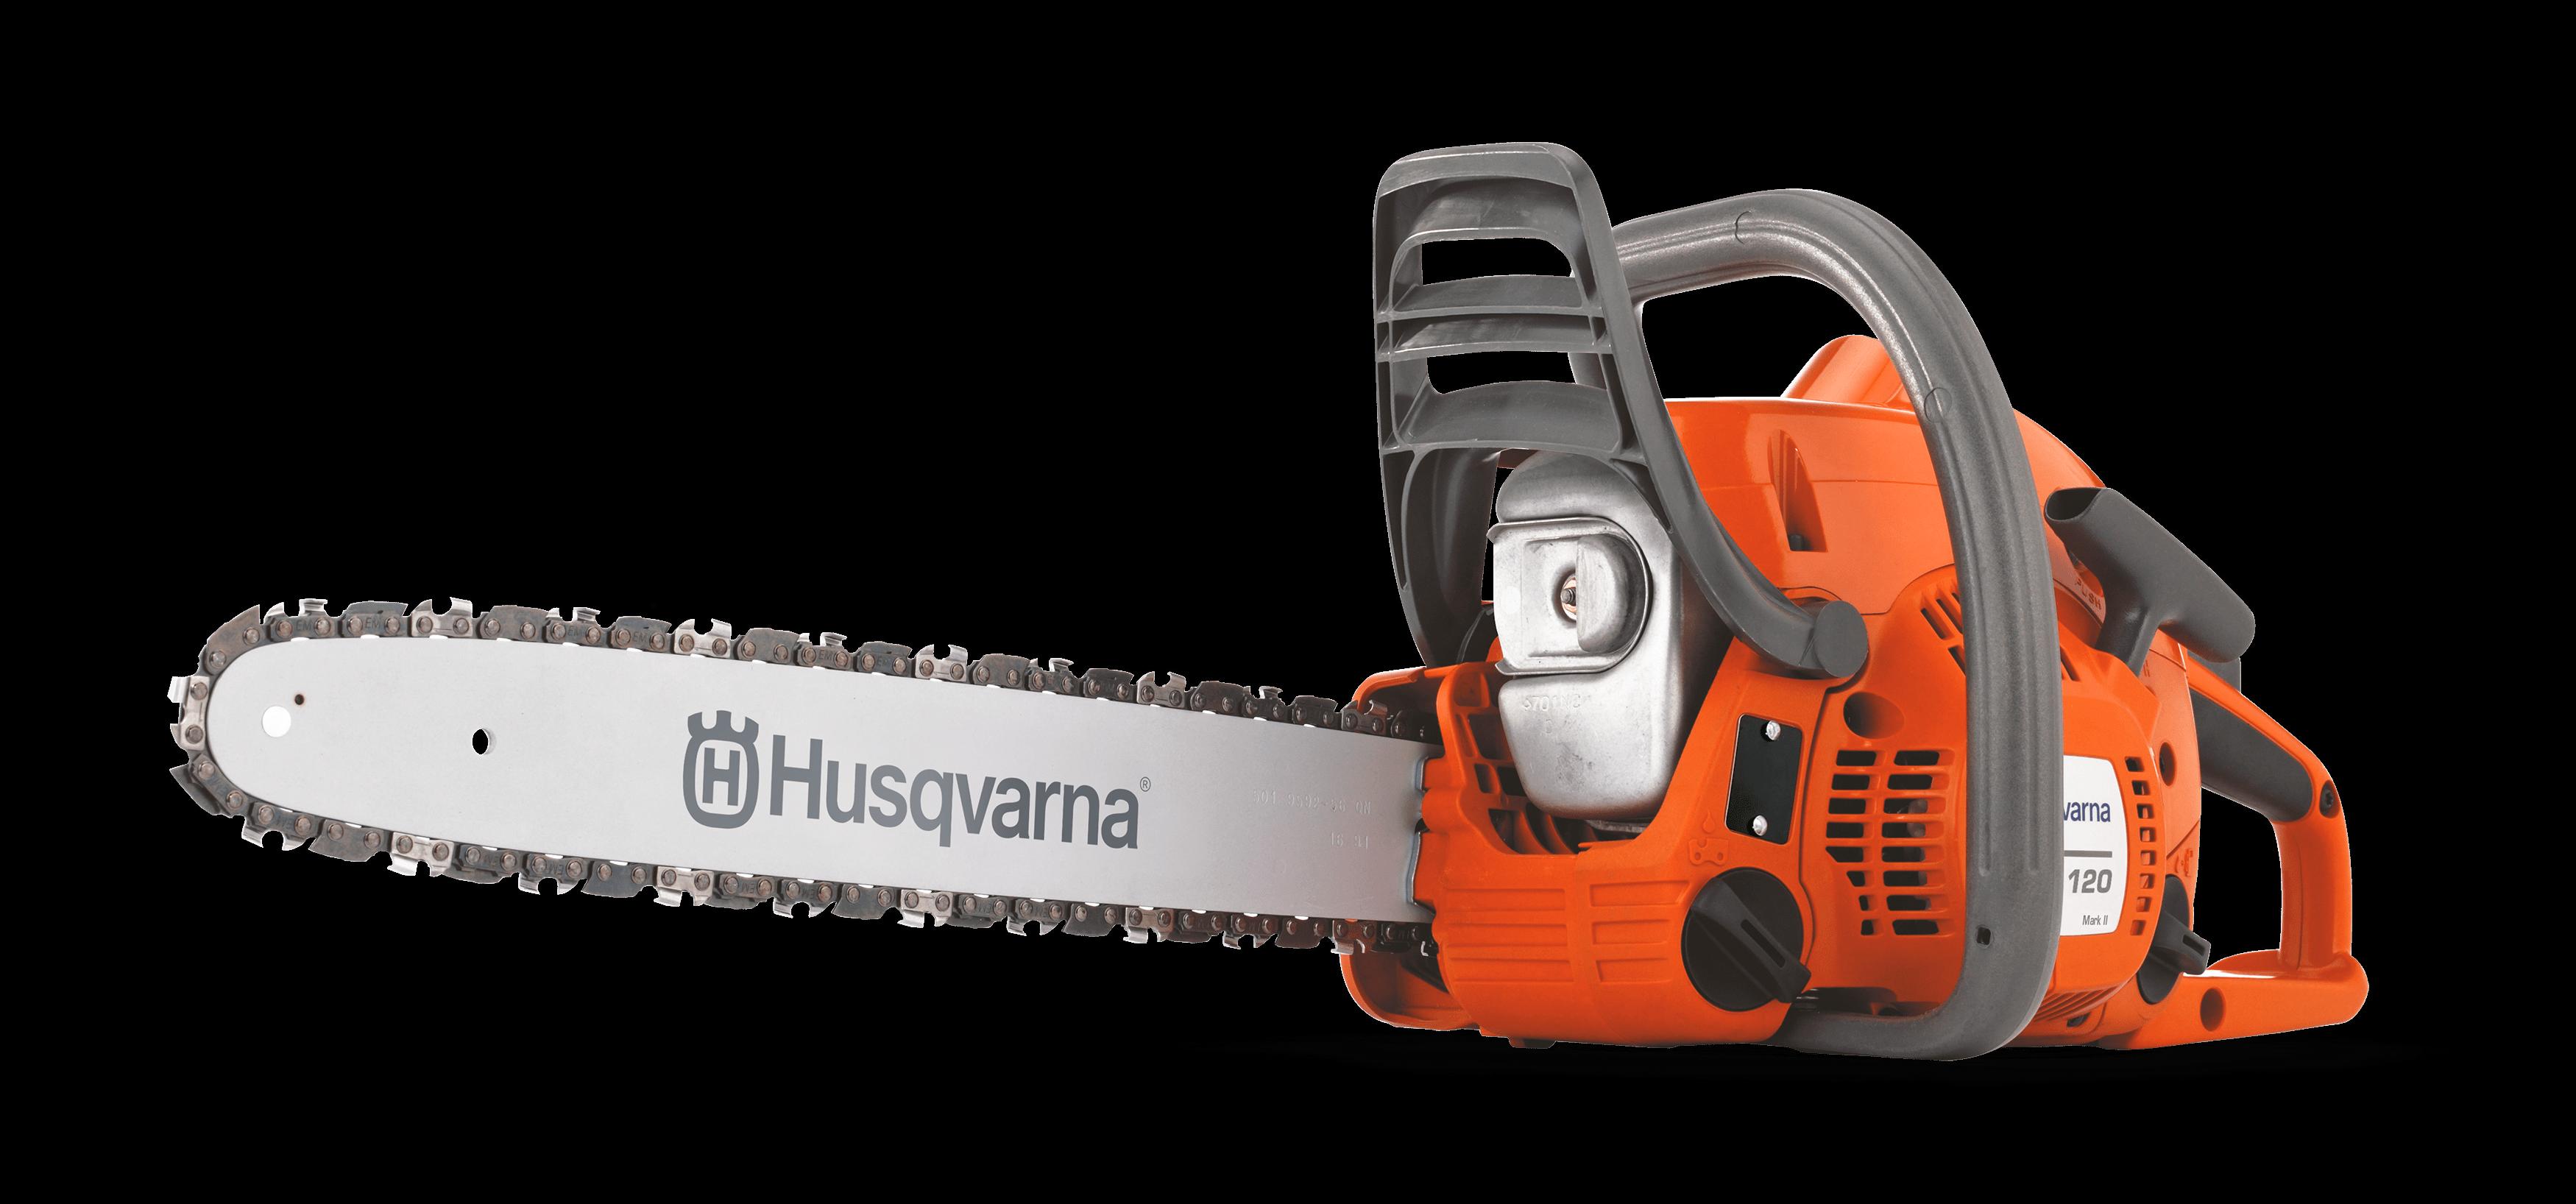 Husqvarna 120 II 14″ Chainsaw